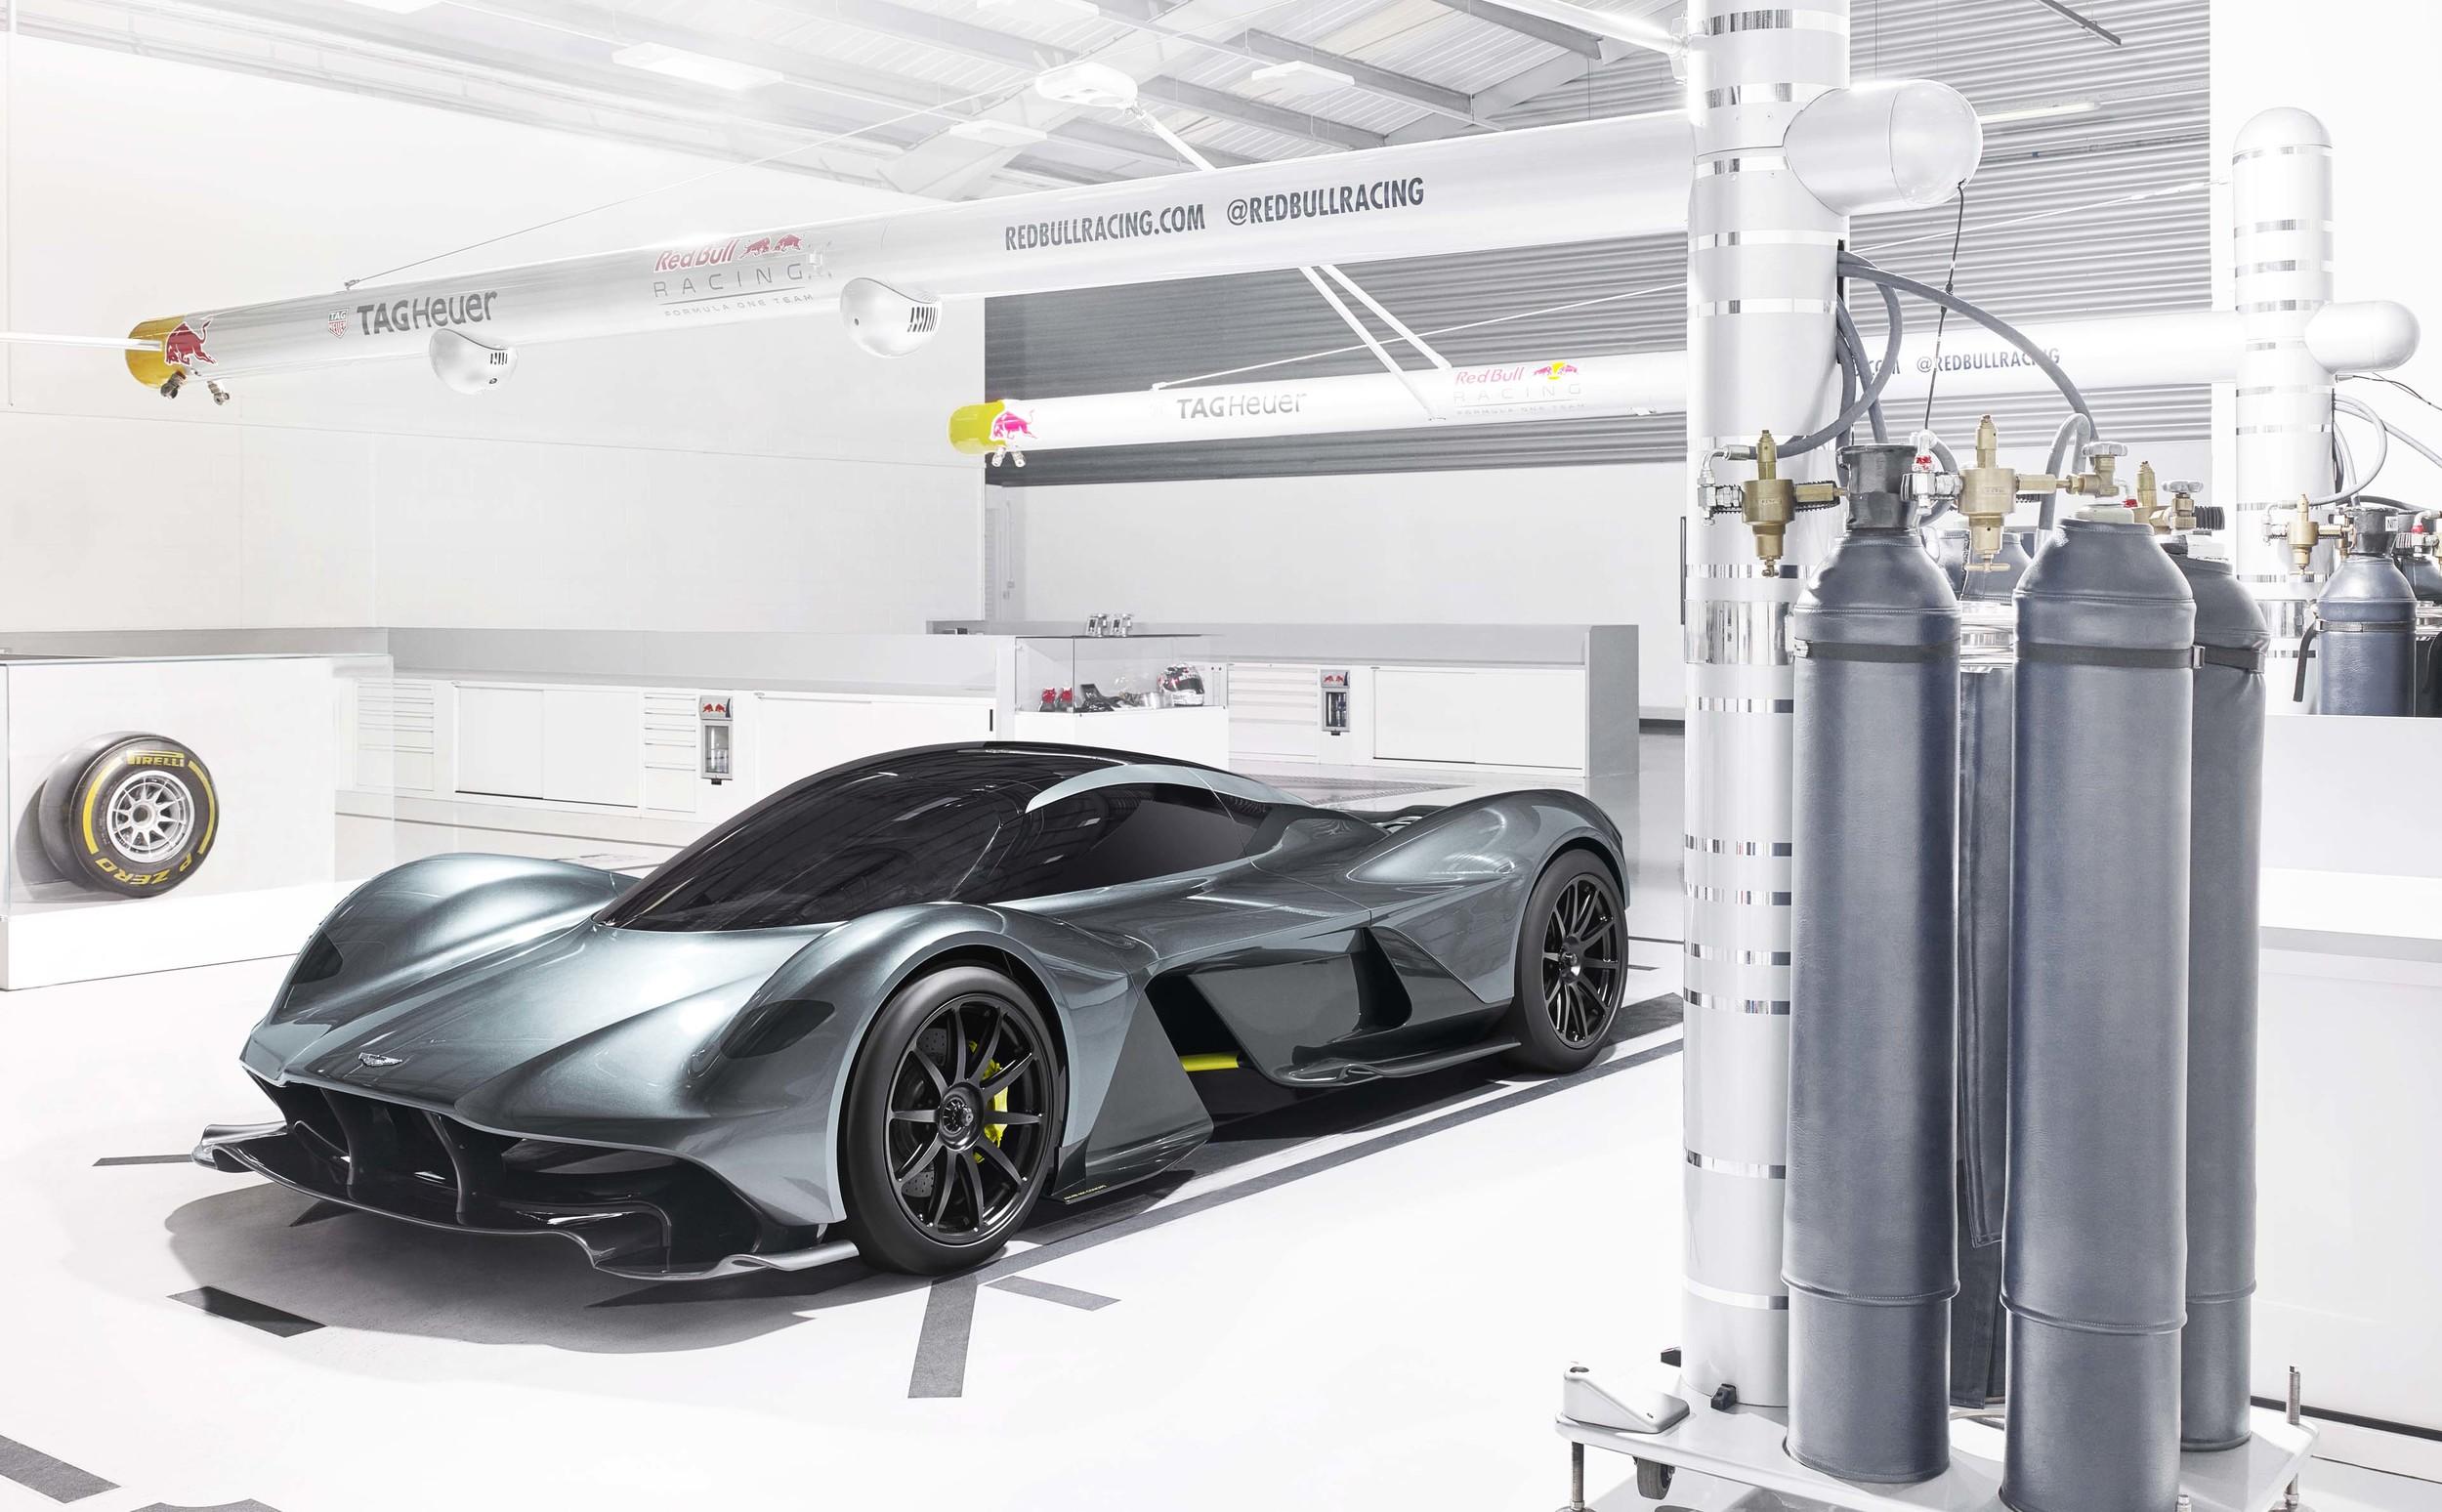 Aston Martin + Red Bull = AM-RB 001